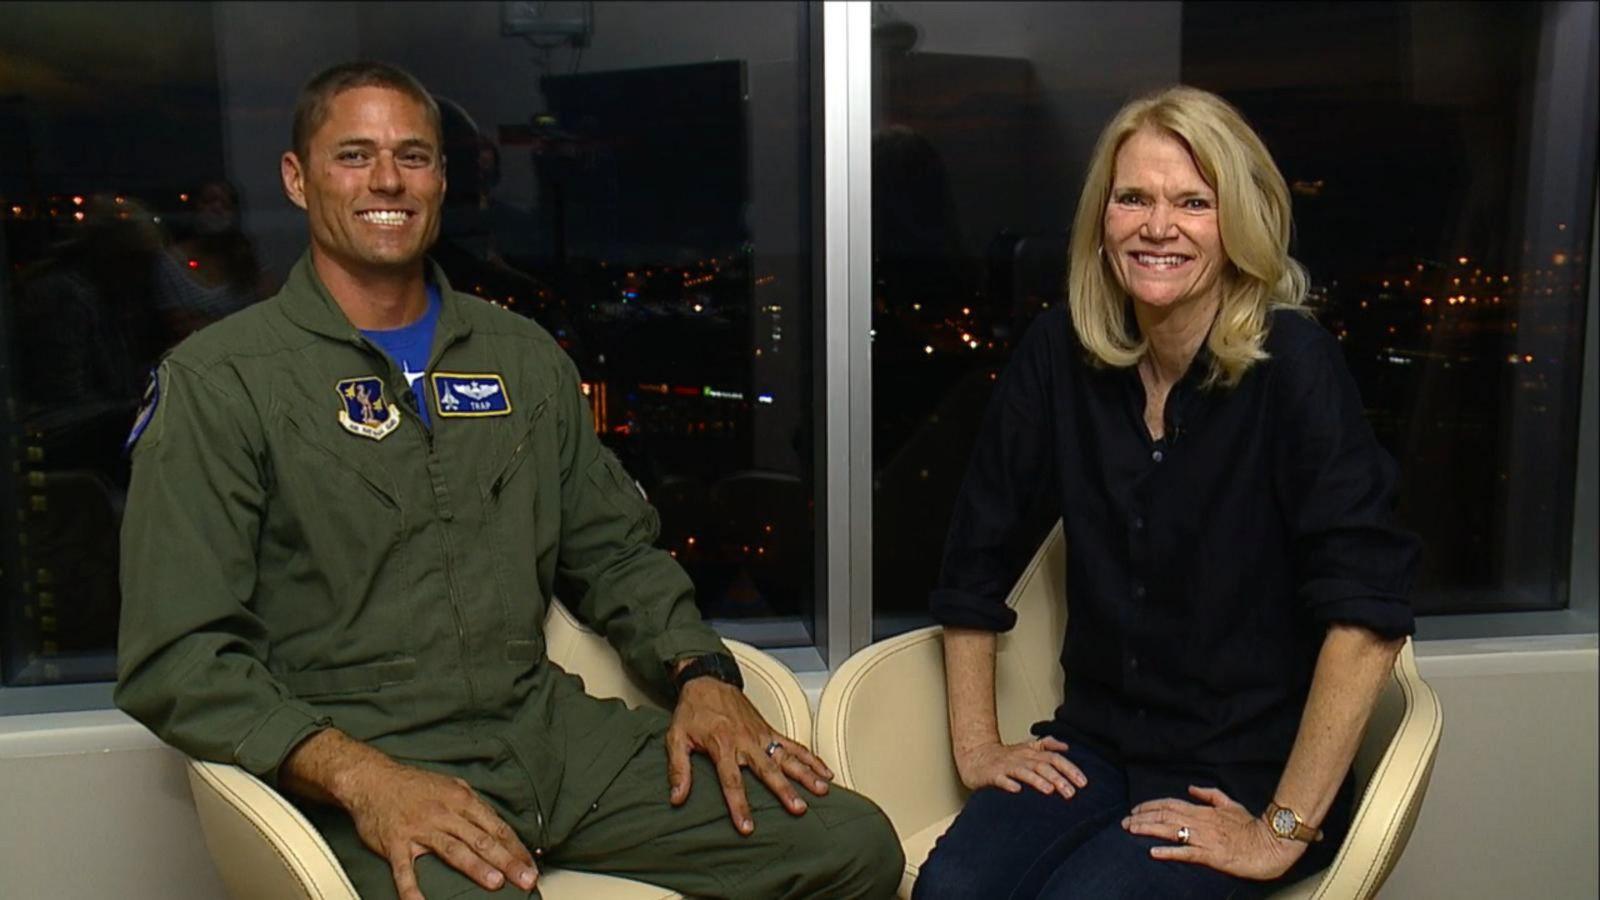 VIDEO: Martha Raddatz Talks to F-15 Pilot Amid NATO War Games in Estonia